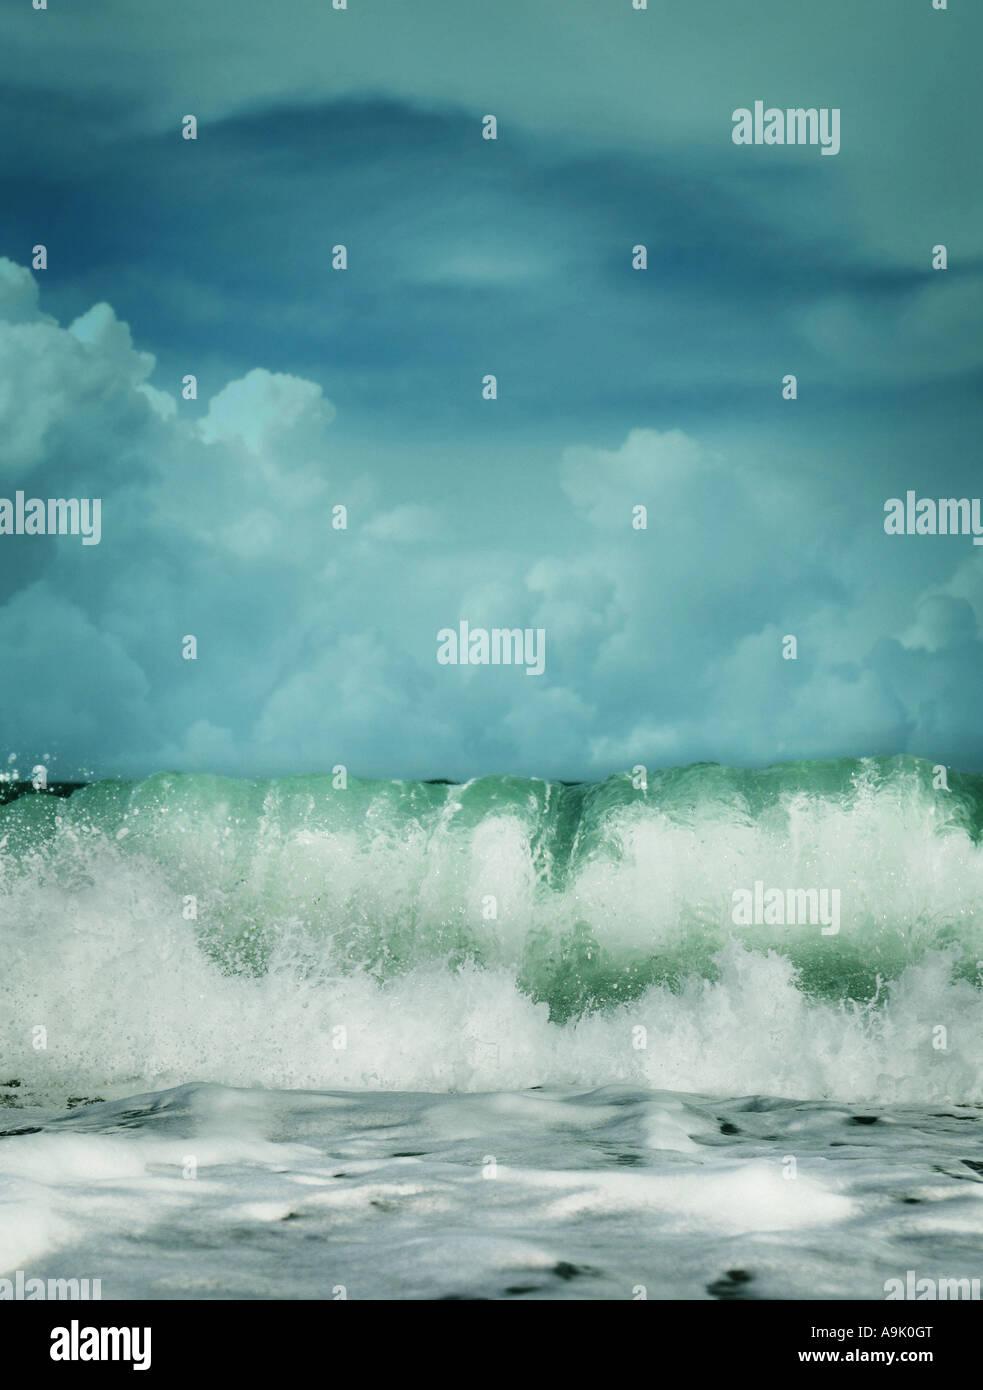 breaking waves - Stock Image